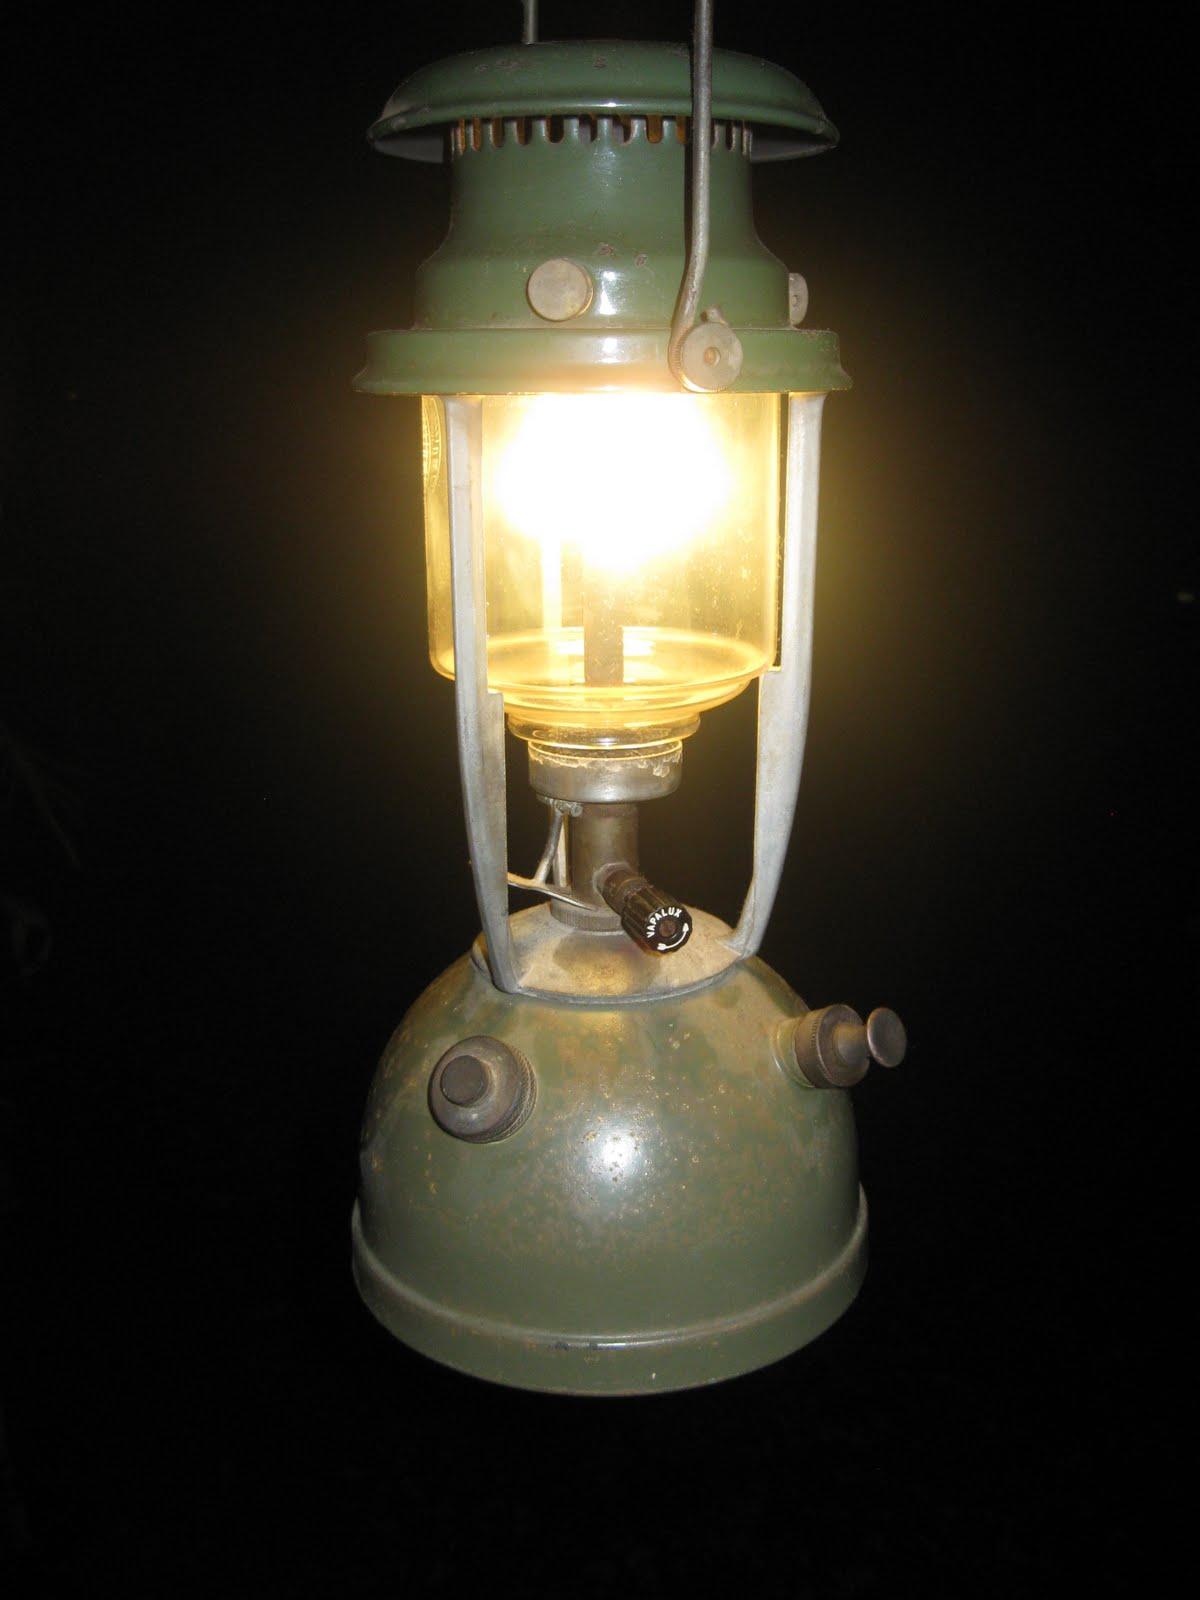 Vintage Coleman Lanterns: Tilley storm lantern & Willis ...